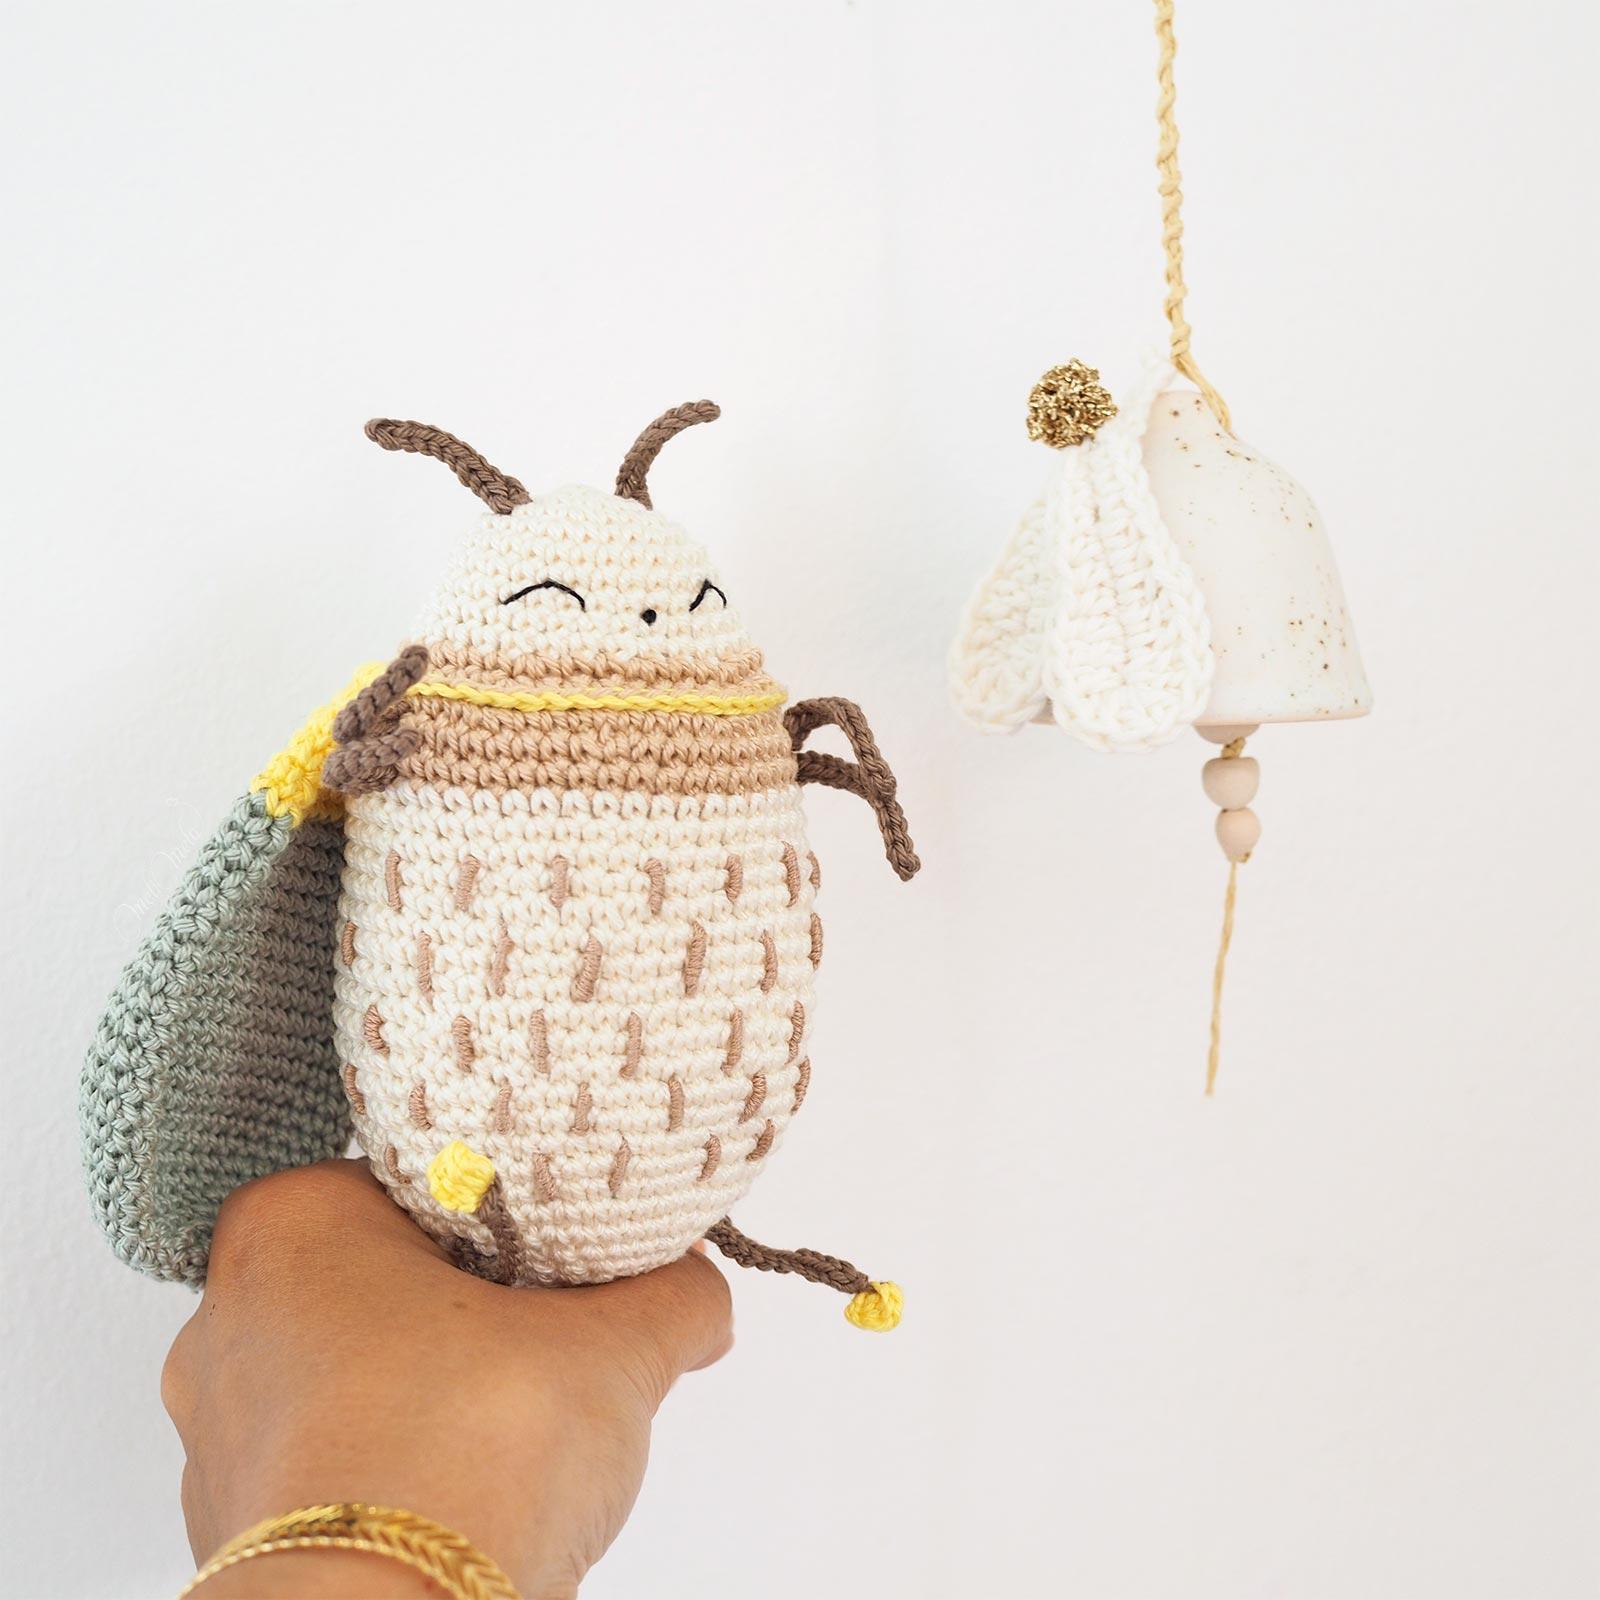 hubertus-bug-scarabee-crochet-broderie-amigurumi-eleonorandmaurice-laboutiquedemelimelo